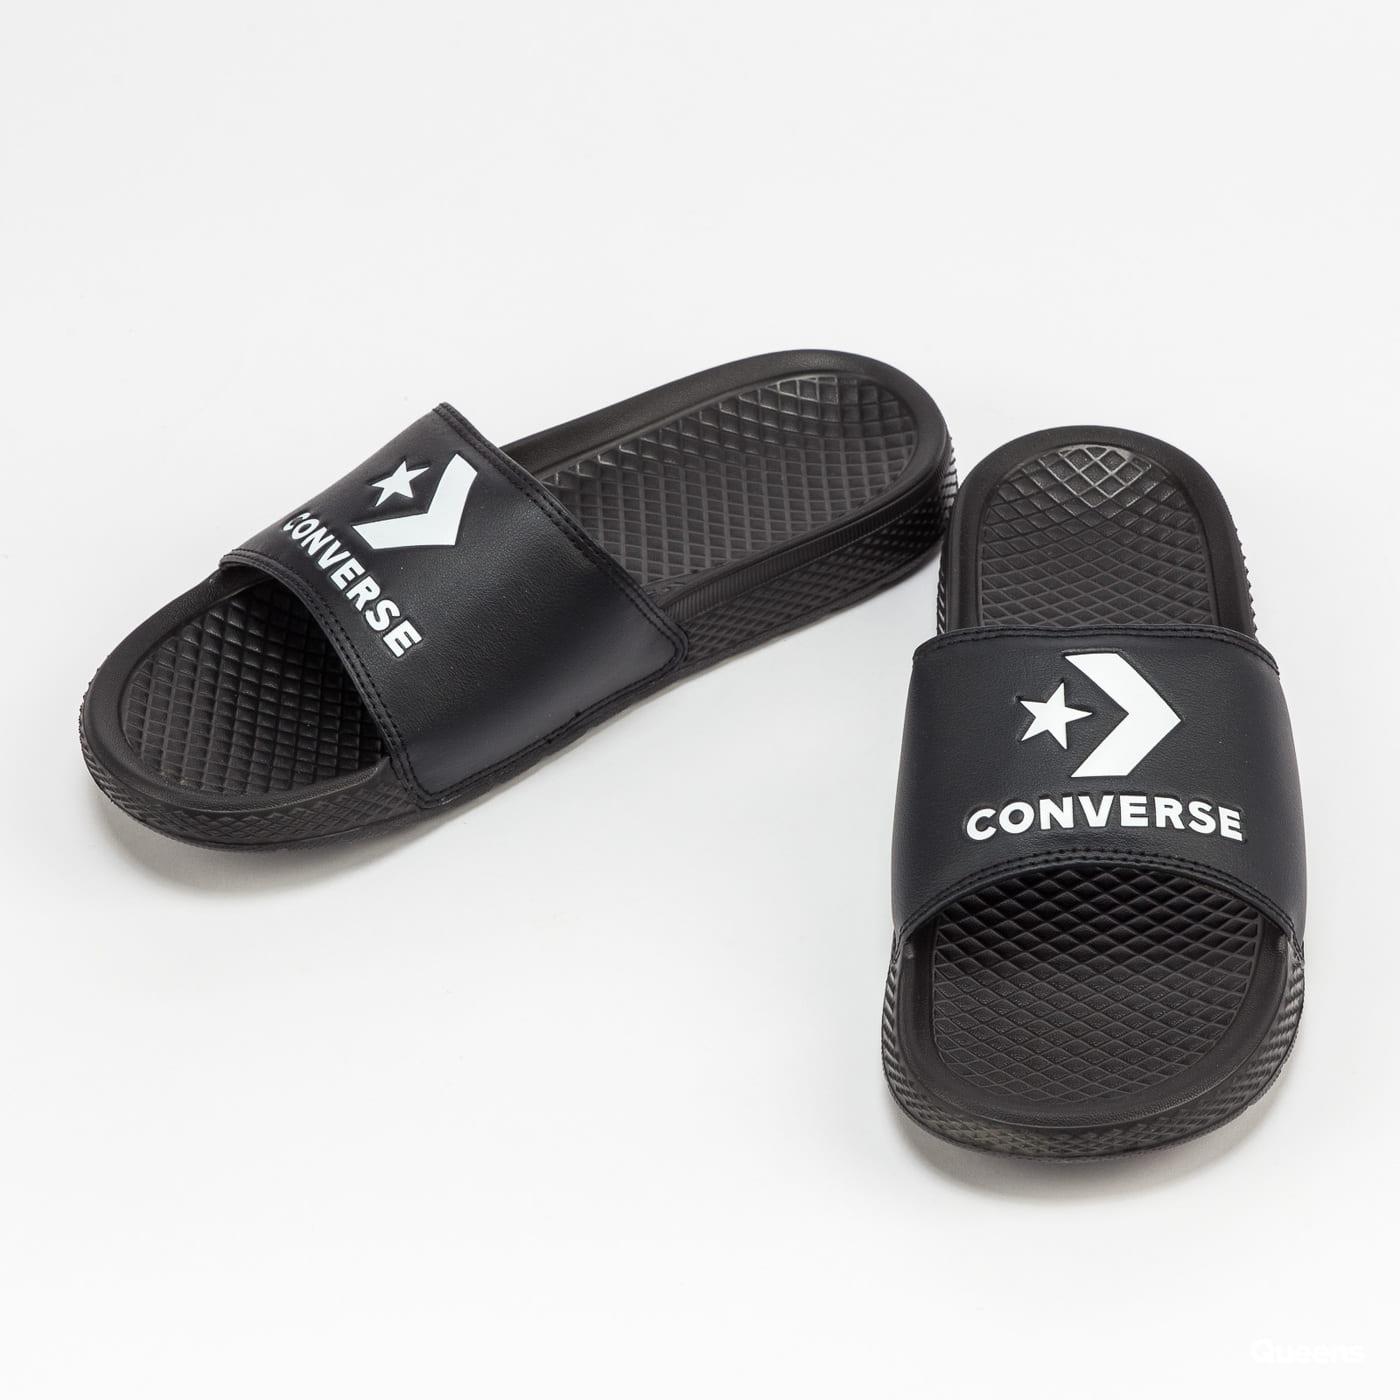 Converse Chuck Taylor All Star Slide black / white / black